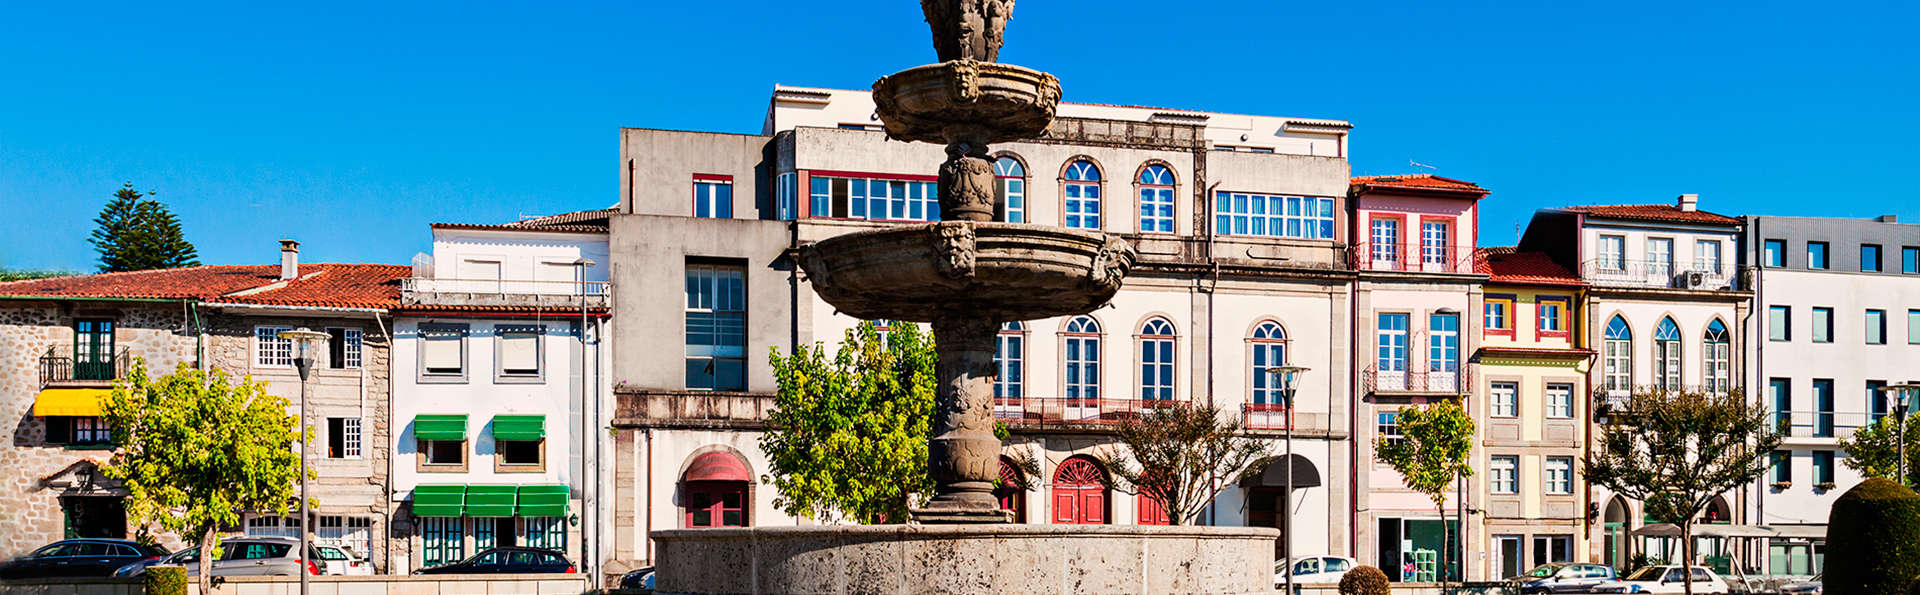 Golden Tulip Braga Hotel & Spa - EDIT_destination.jpg